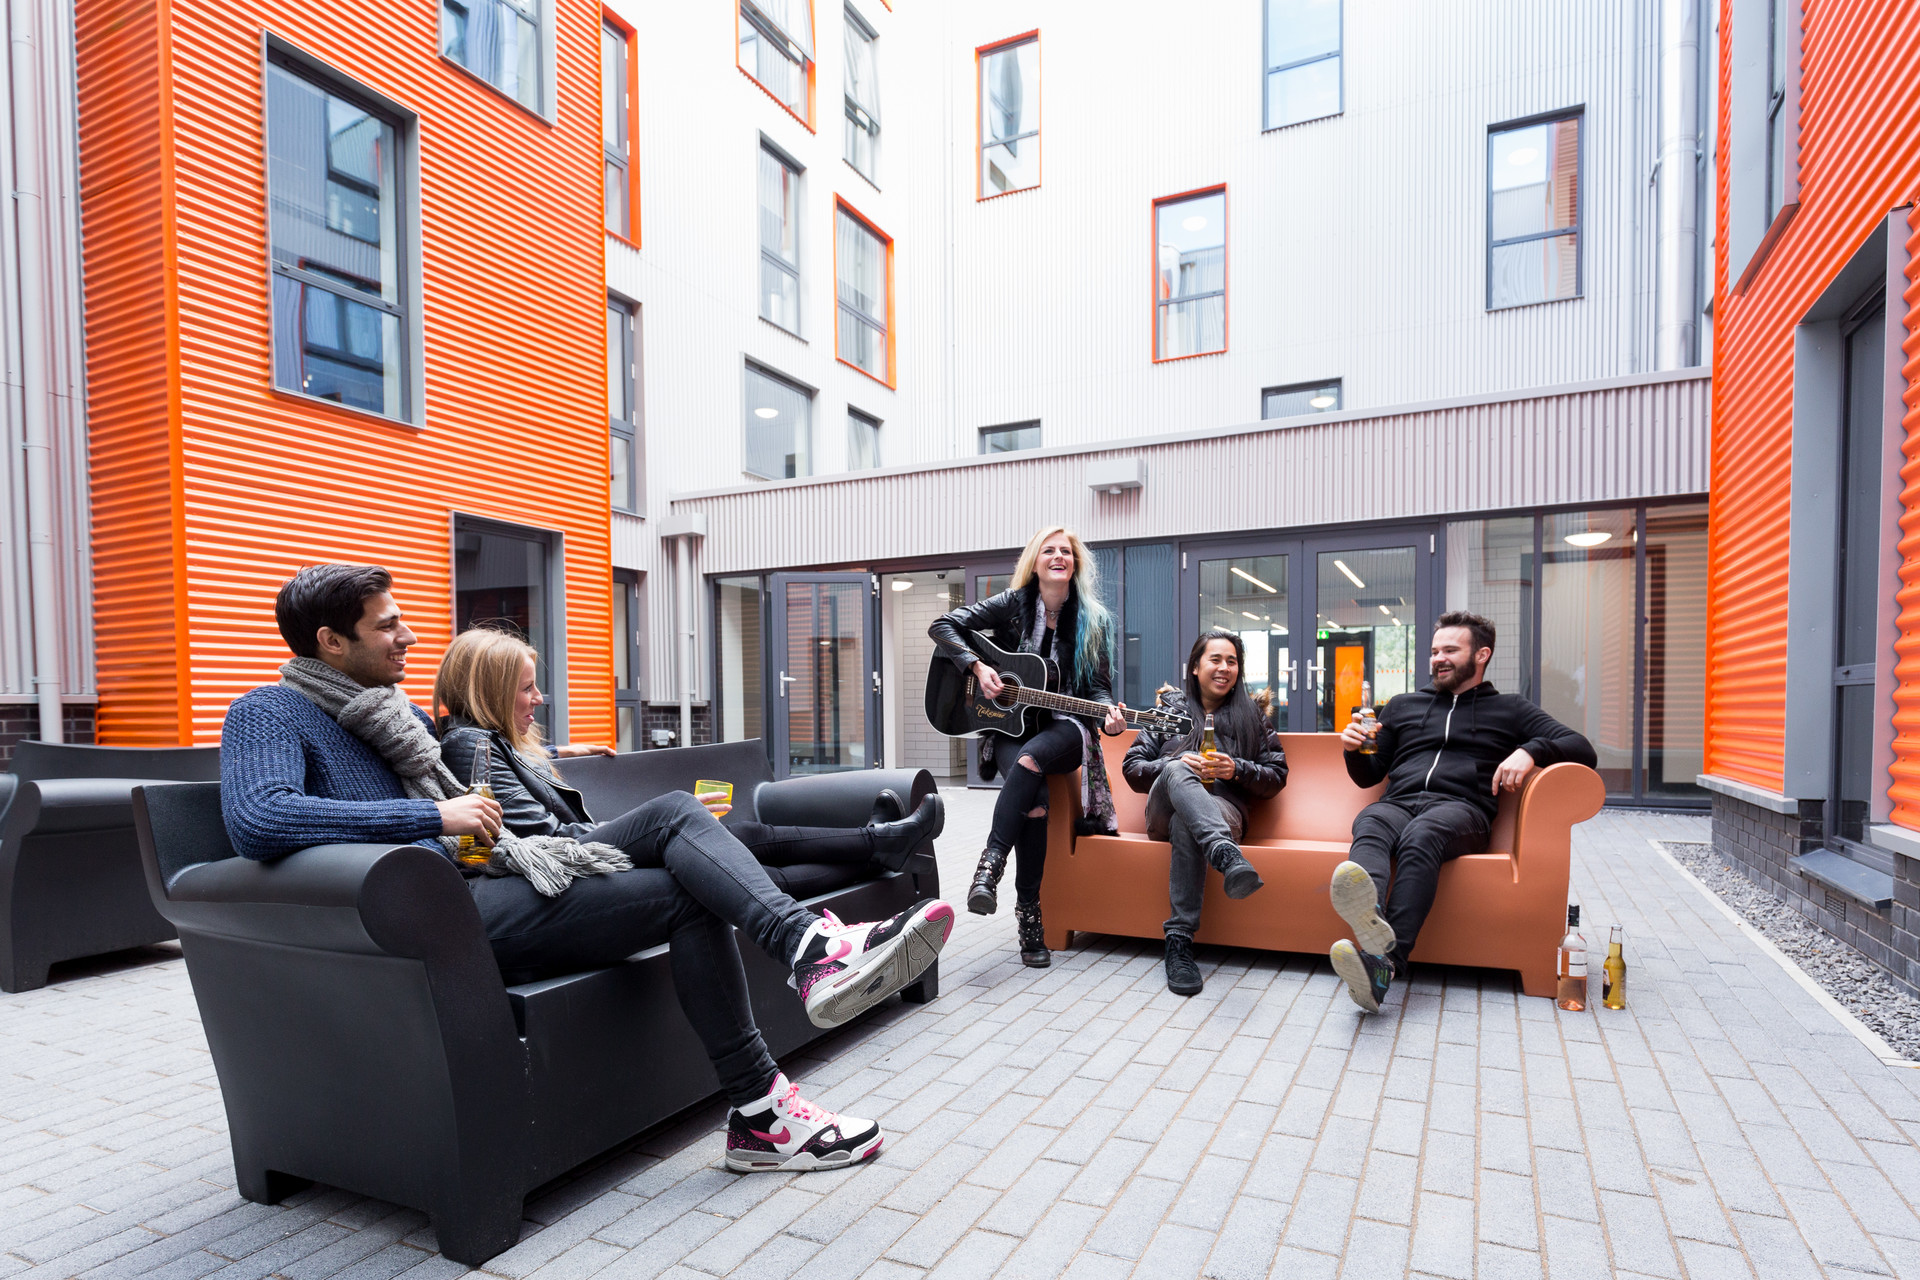 cozy-studio-flat-new-northumbria-university-newcastle-university-7ad06bbebdb4bf43a411e821b1cd0ba0